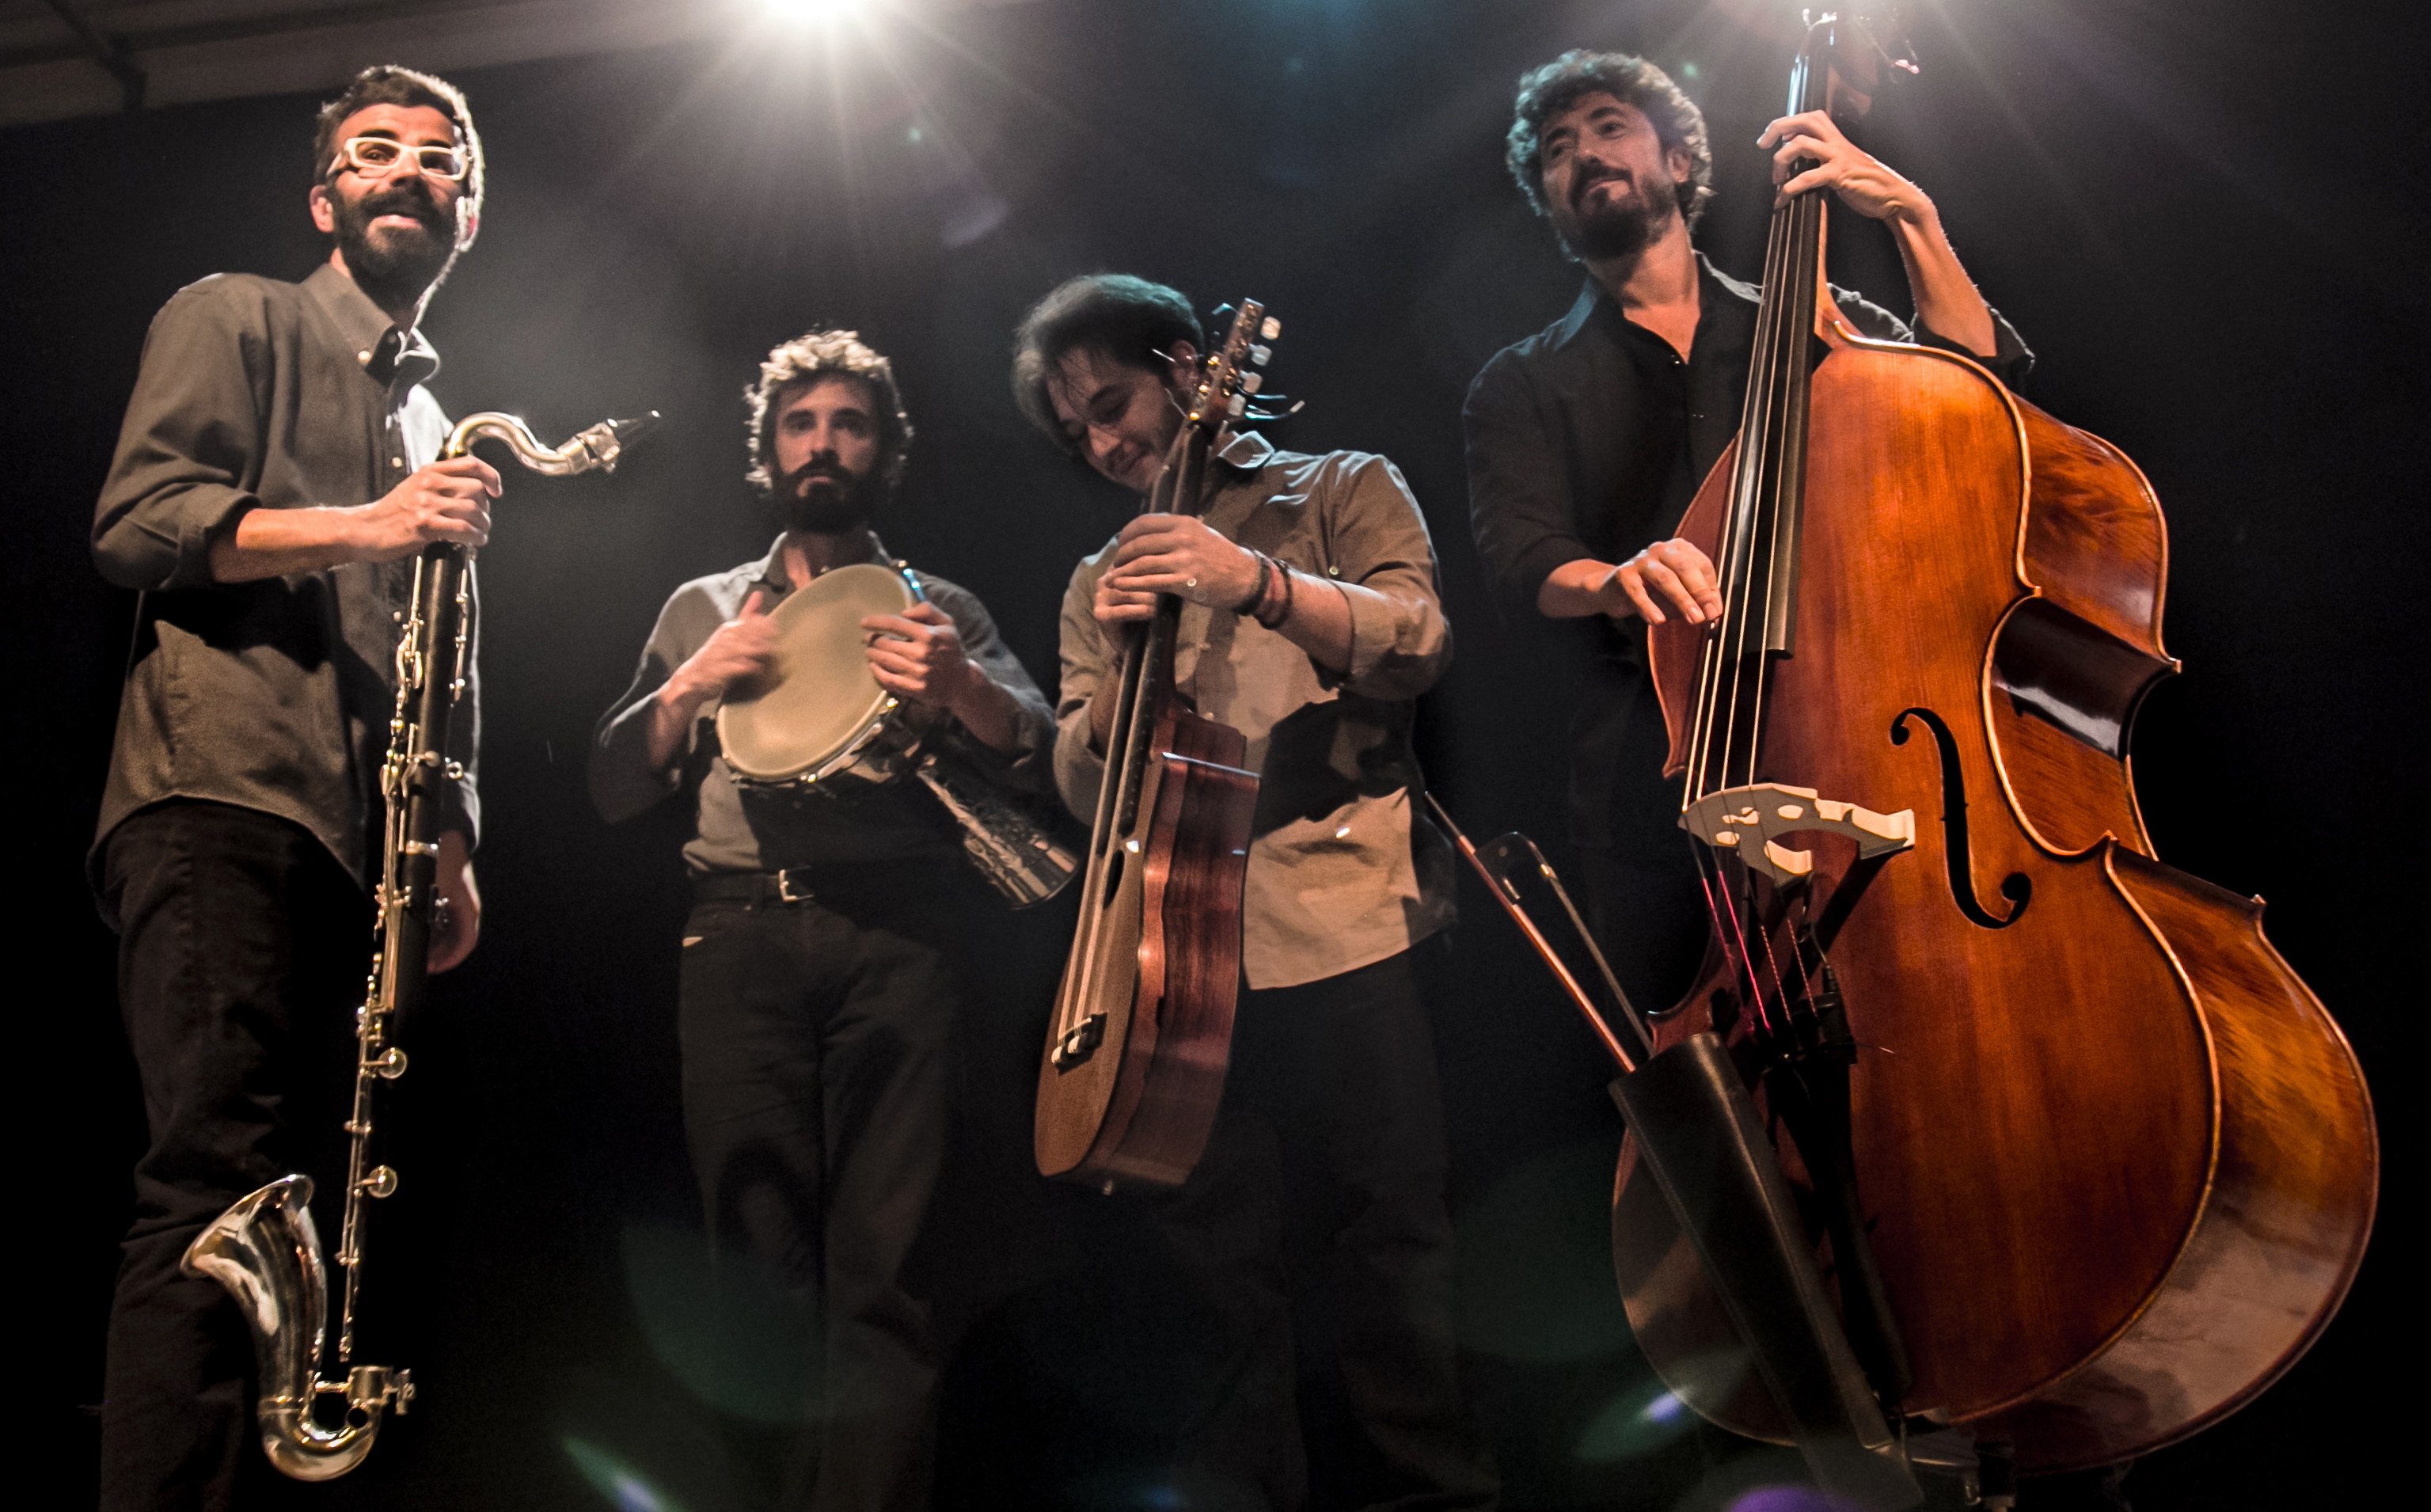 OttoMani. Etno Jazz. photo by Gloria Chillotti